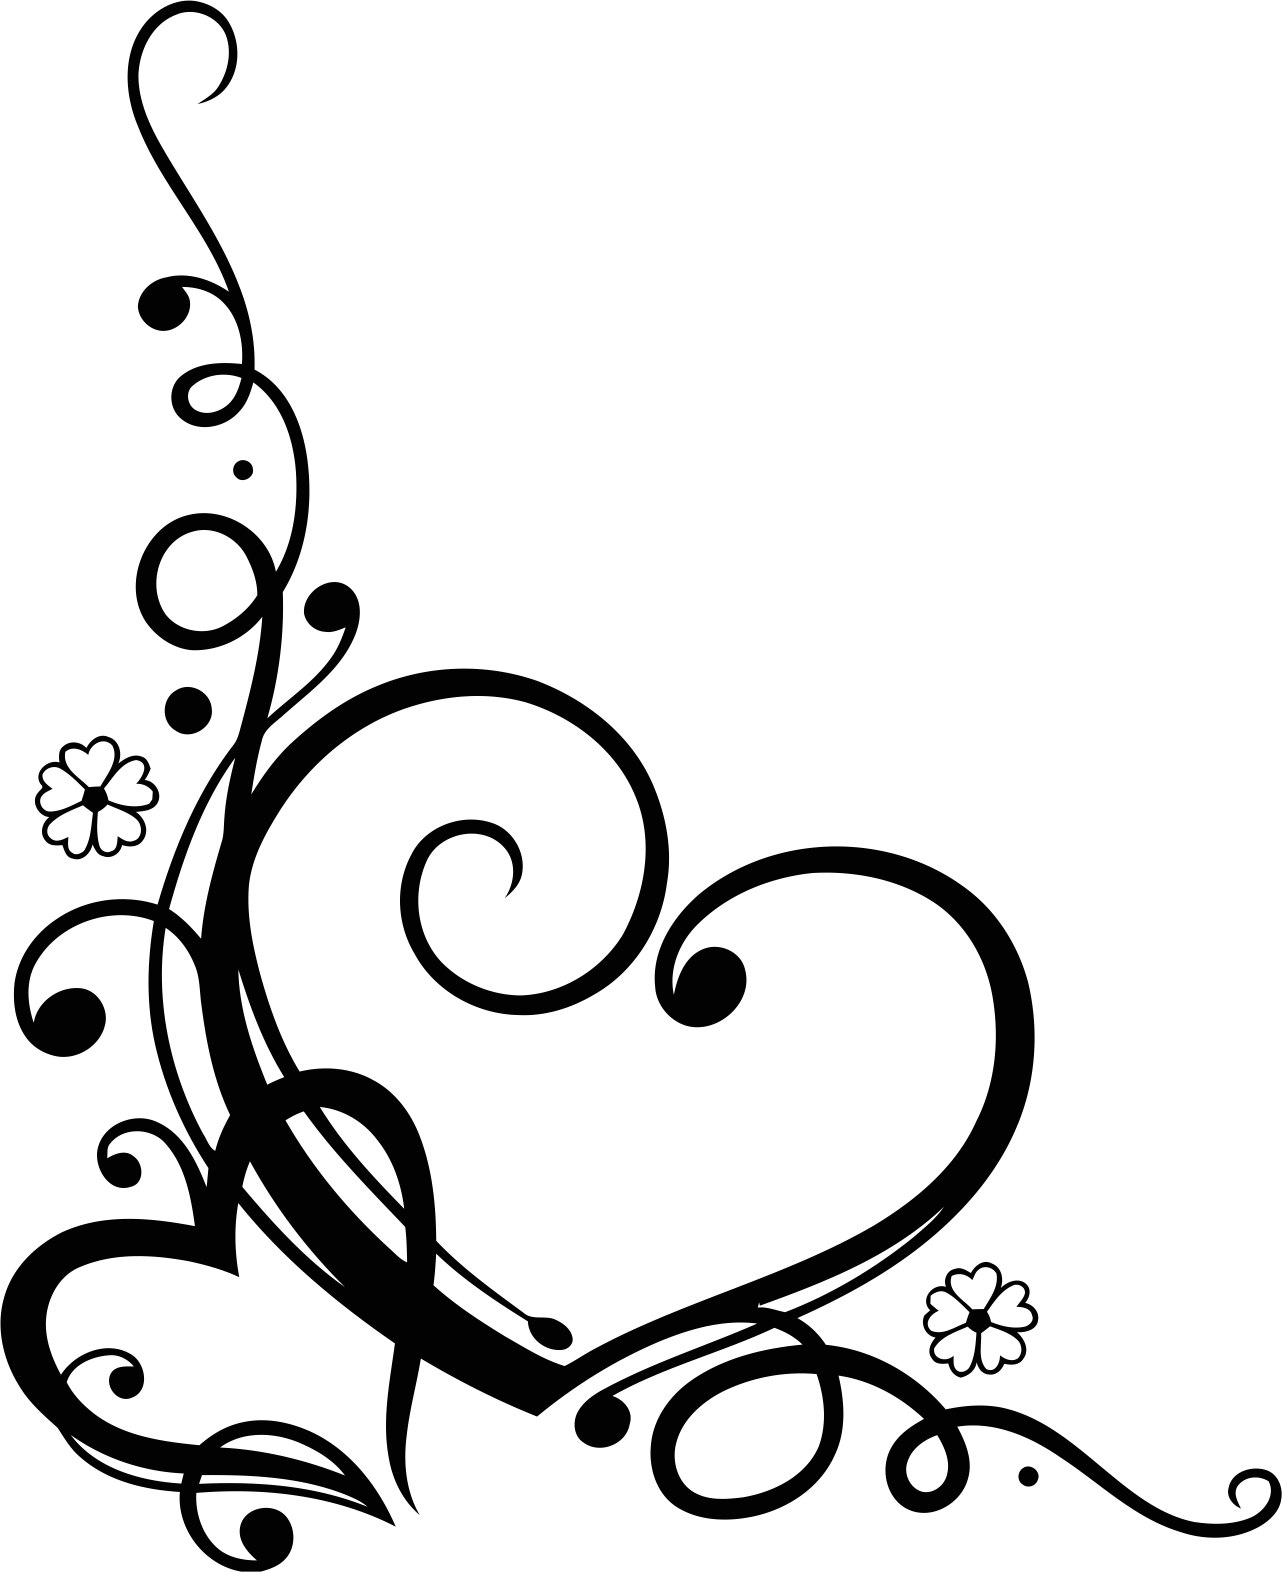 Love Heart Floral File Free CDR Vectors Art